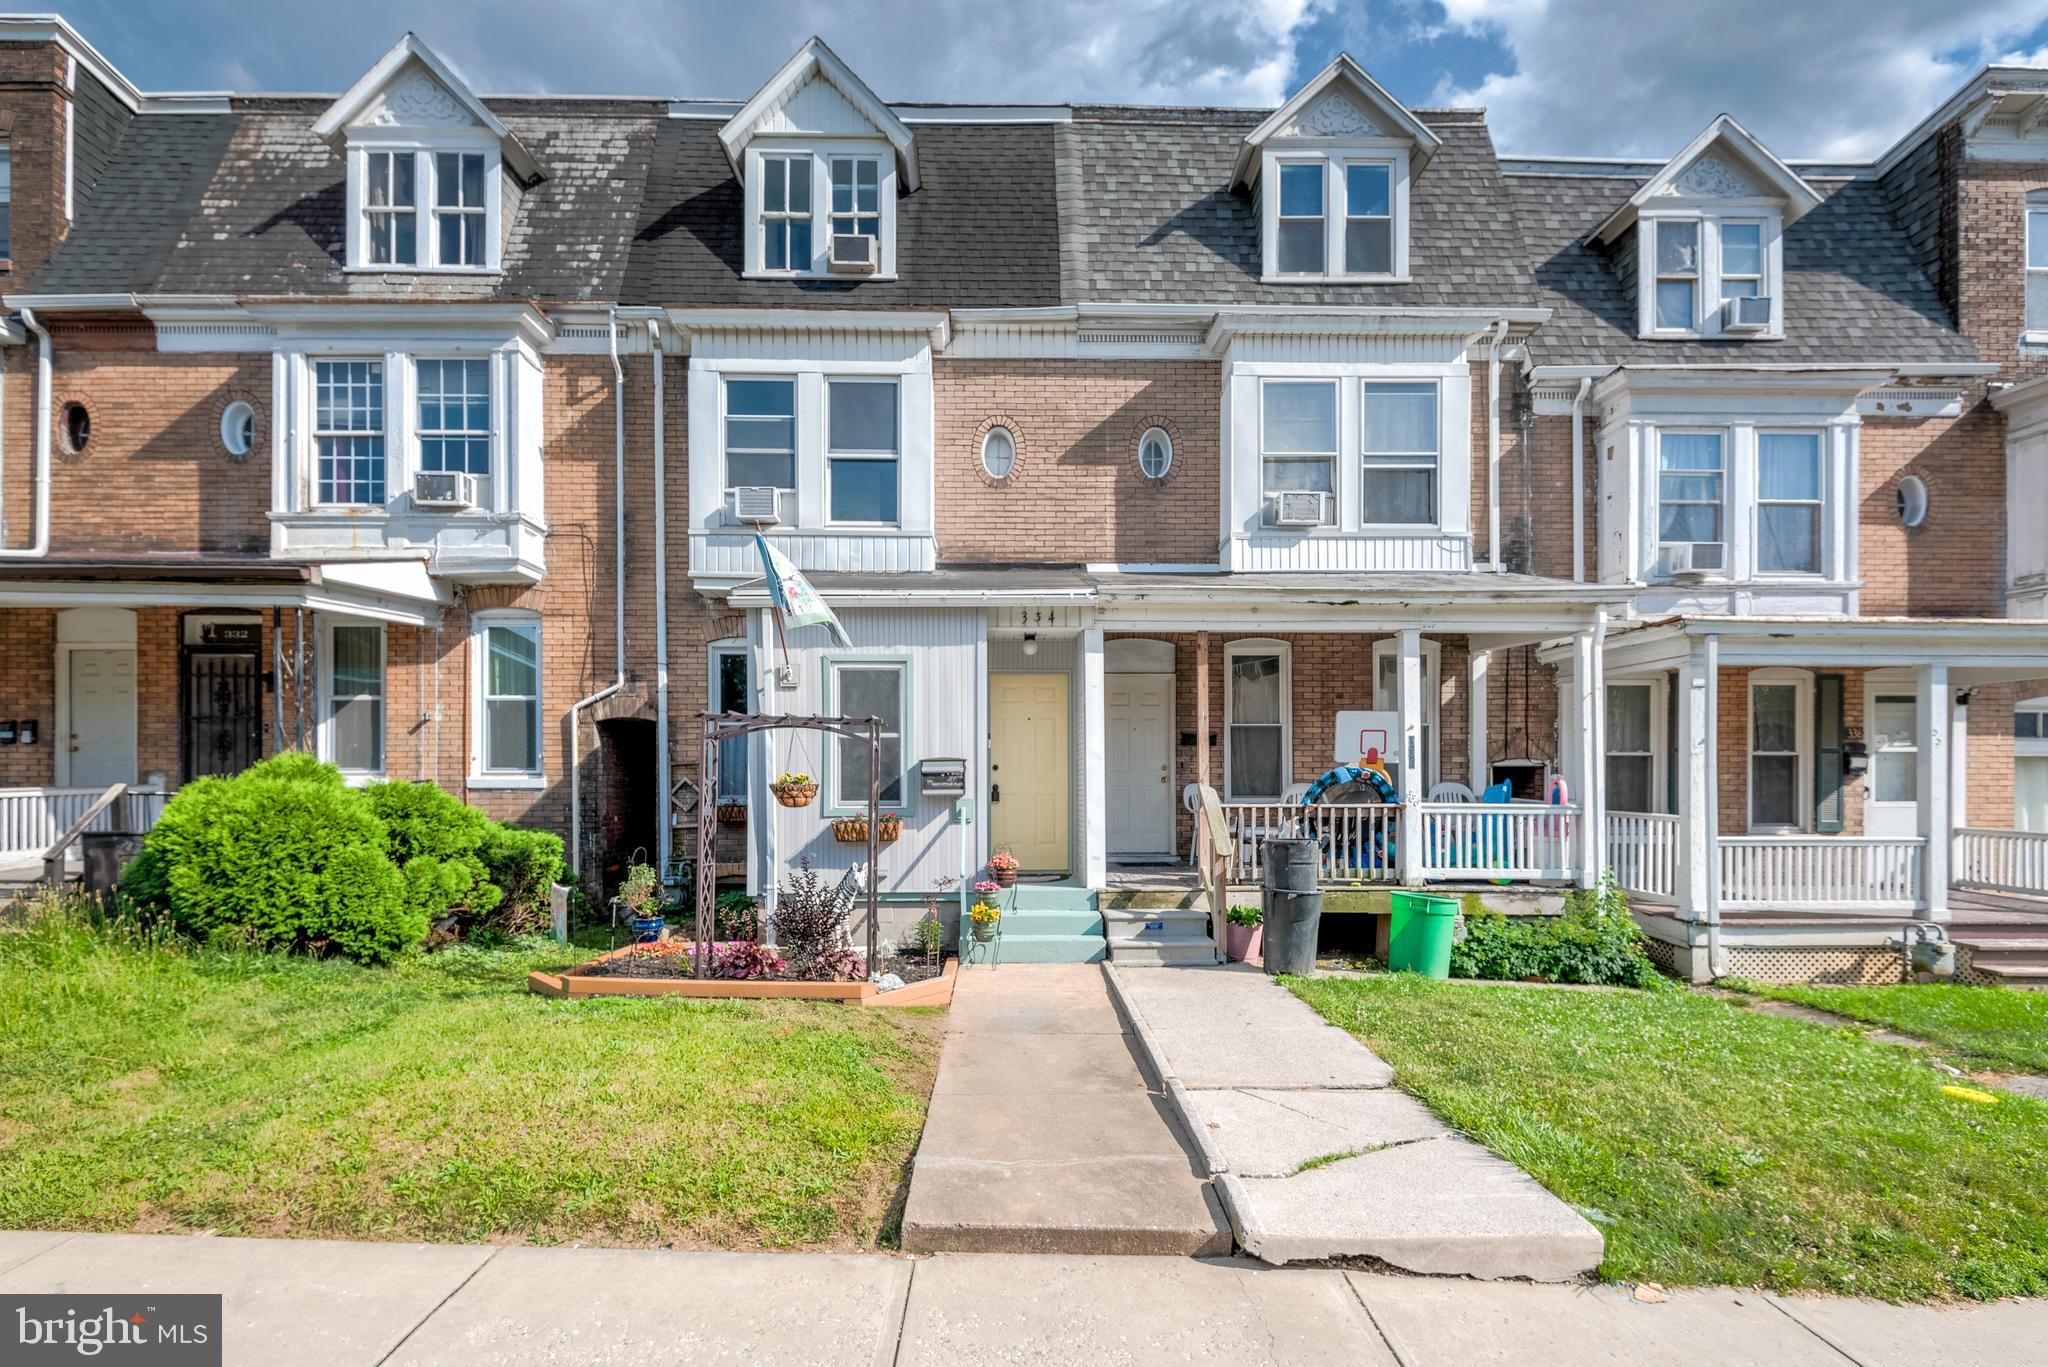 334 W Cottage Place, York, PA 17401